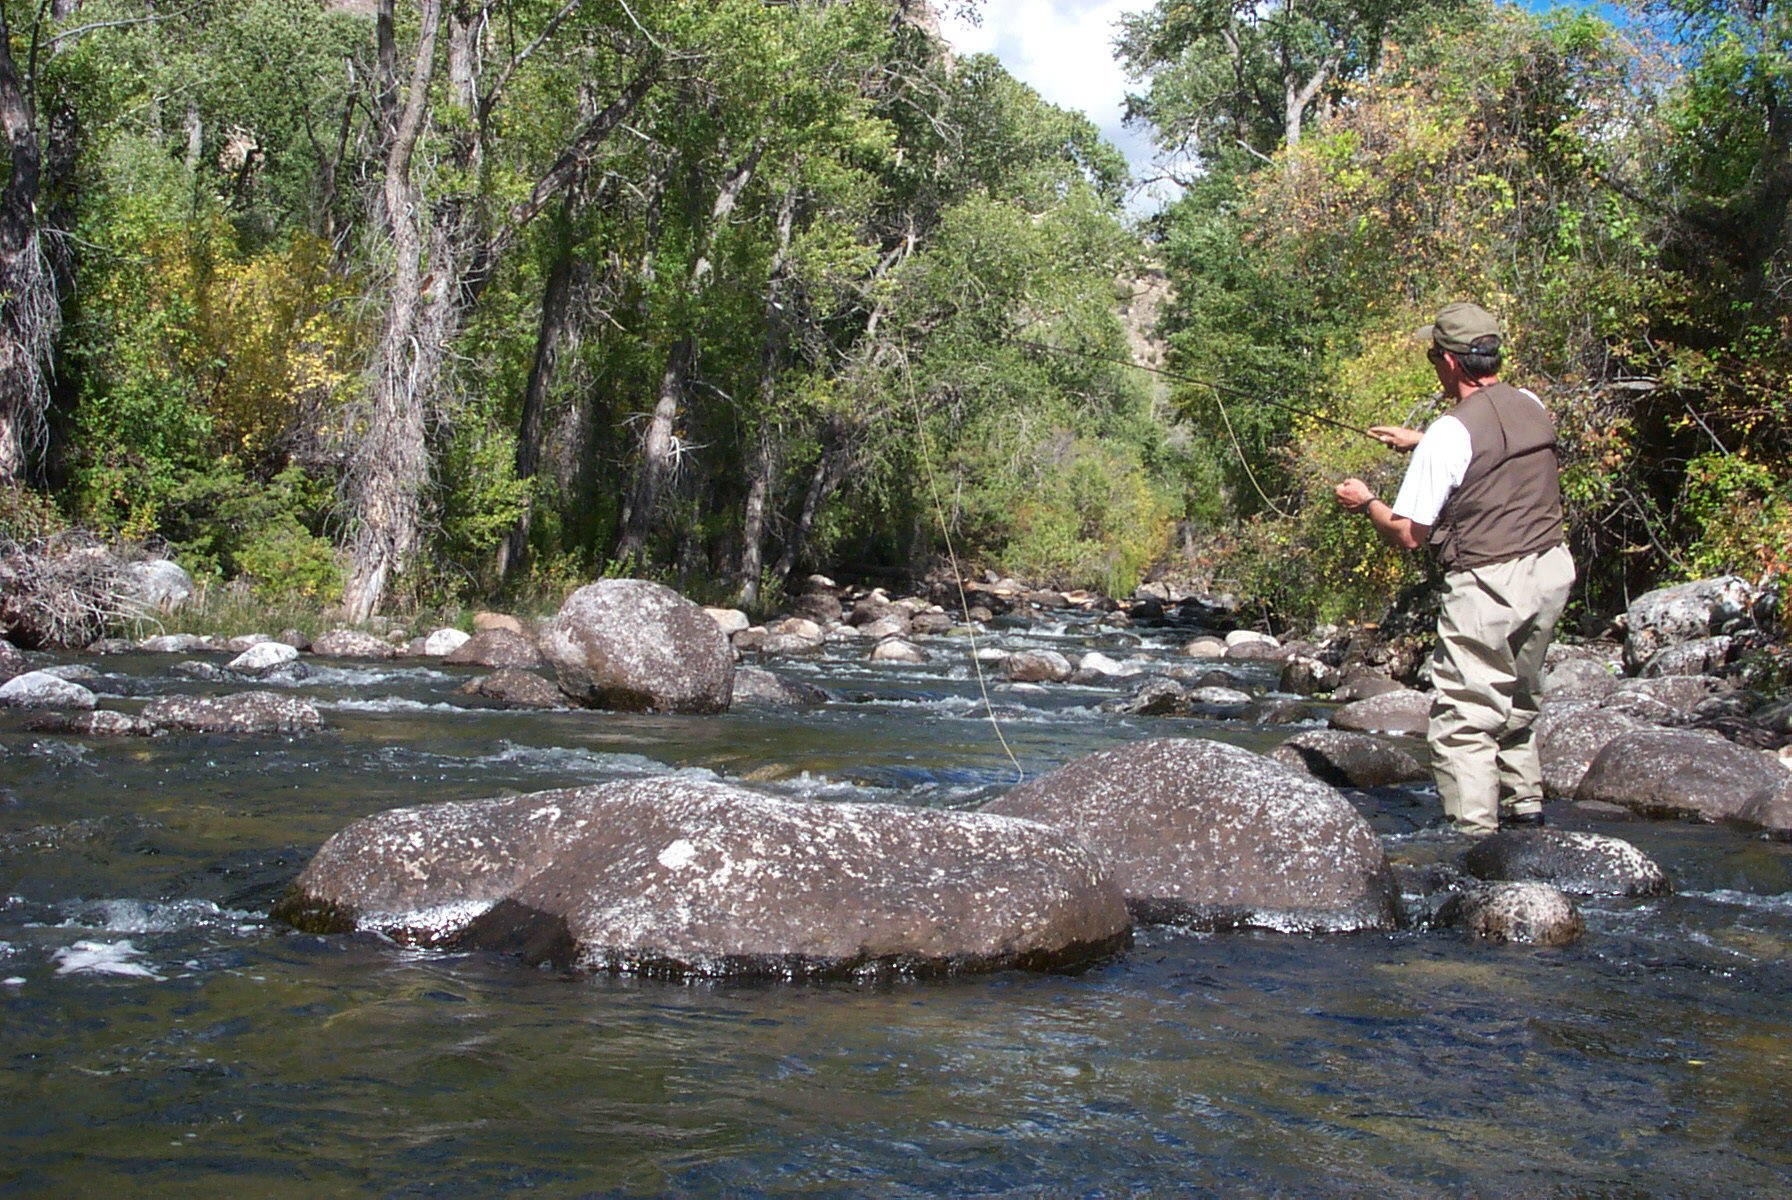 Wyoming game and fish department tensleep creek for Wyoming game and fish regulations